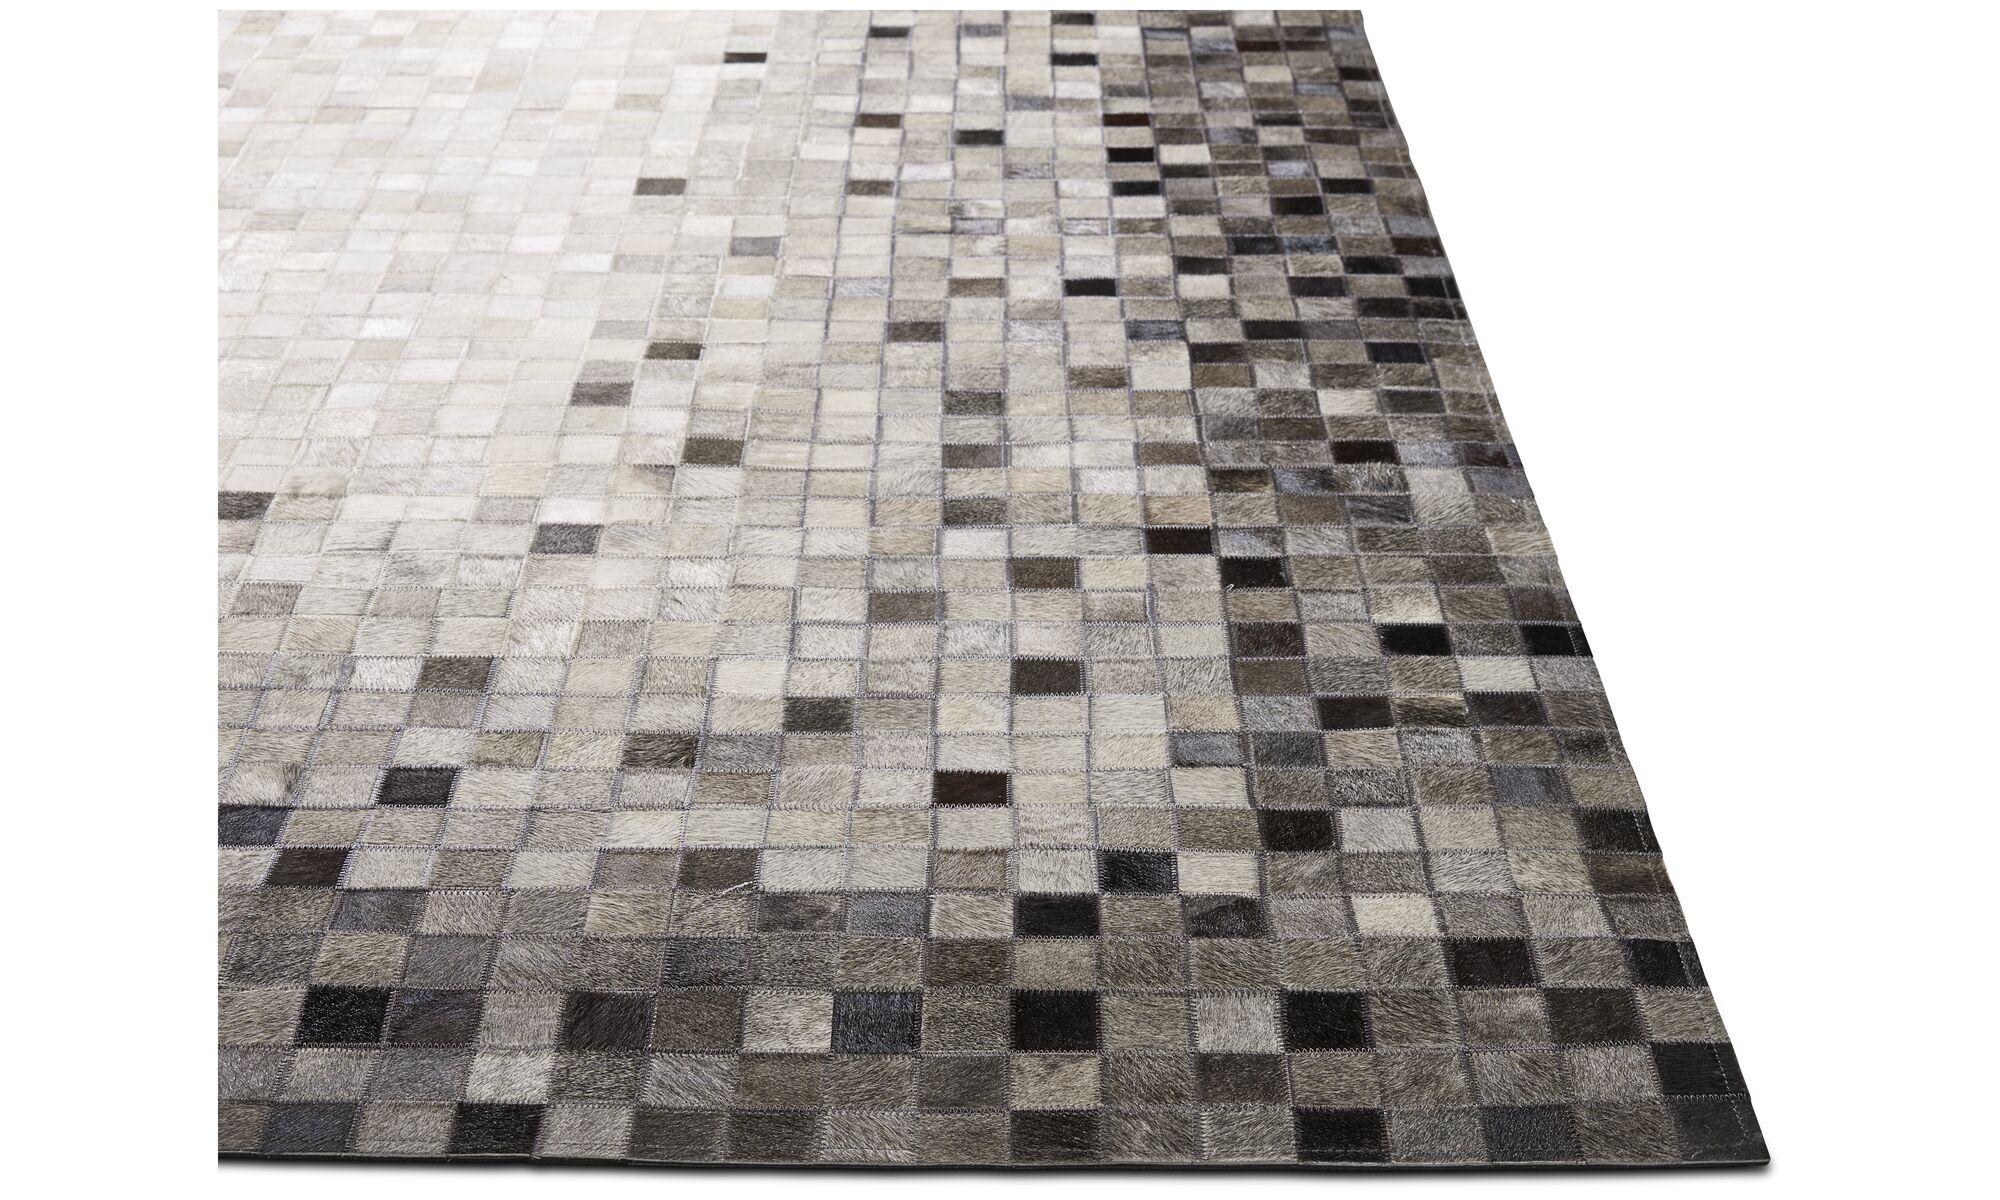 teppich outlet hamburg scandinavia teppich x cm grau. Black Bedroom Furniture Sets. Home Design Ideas